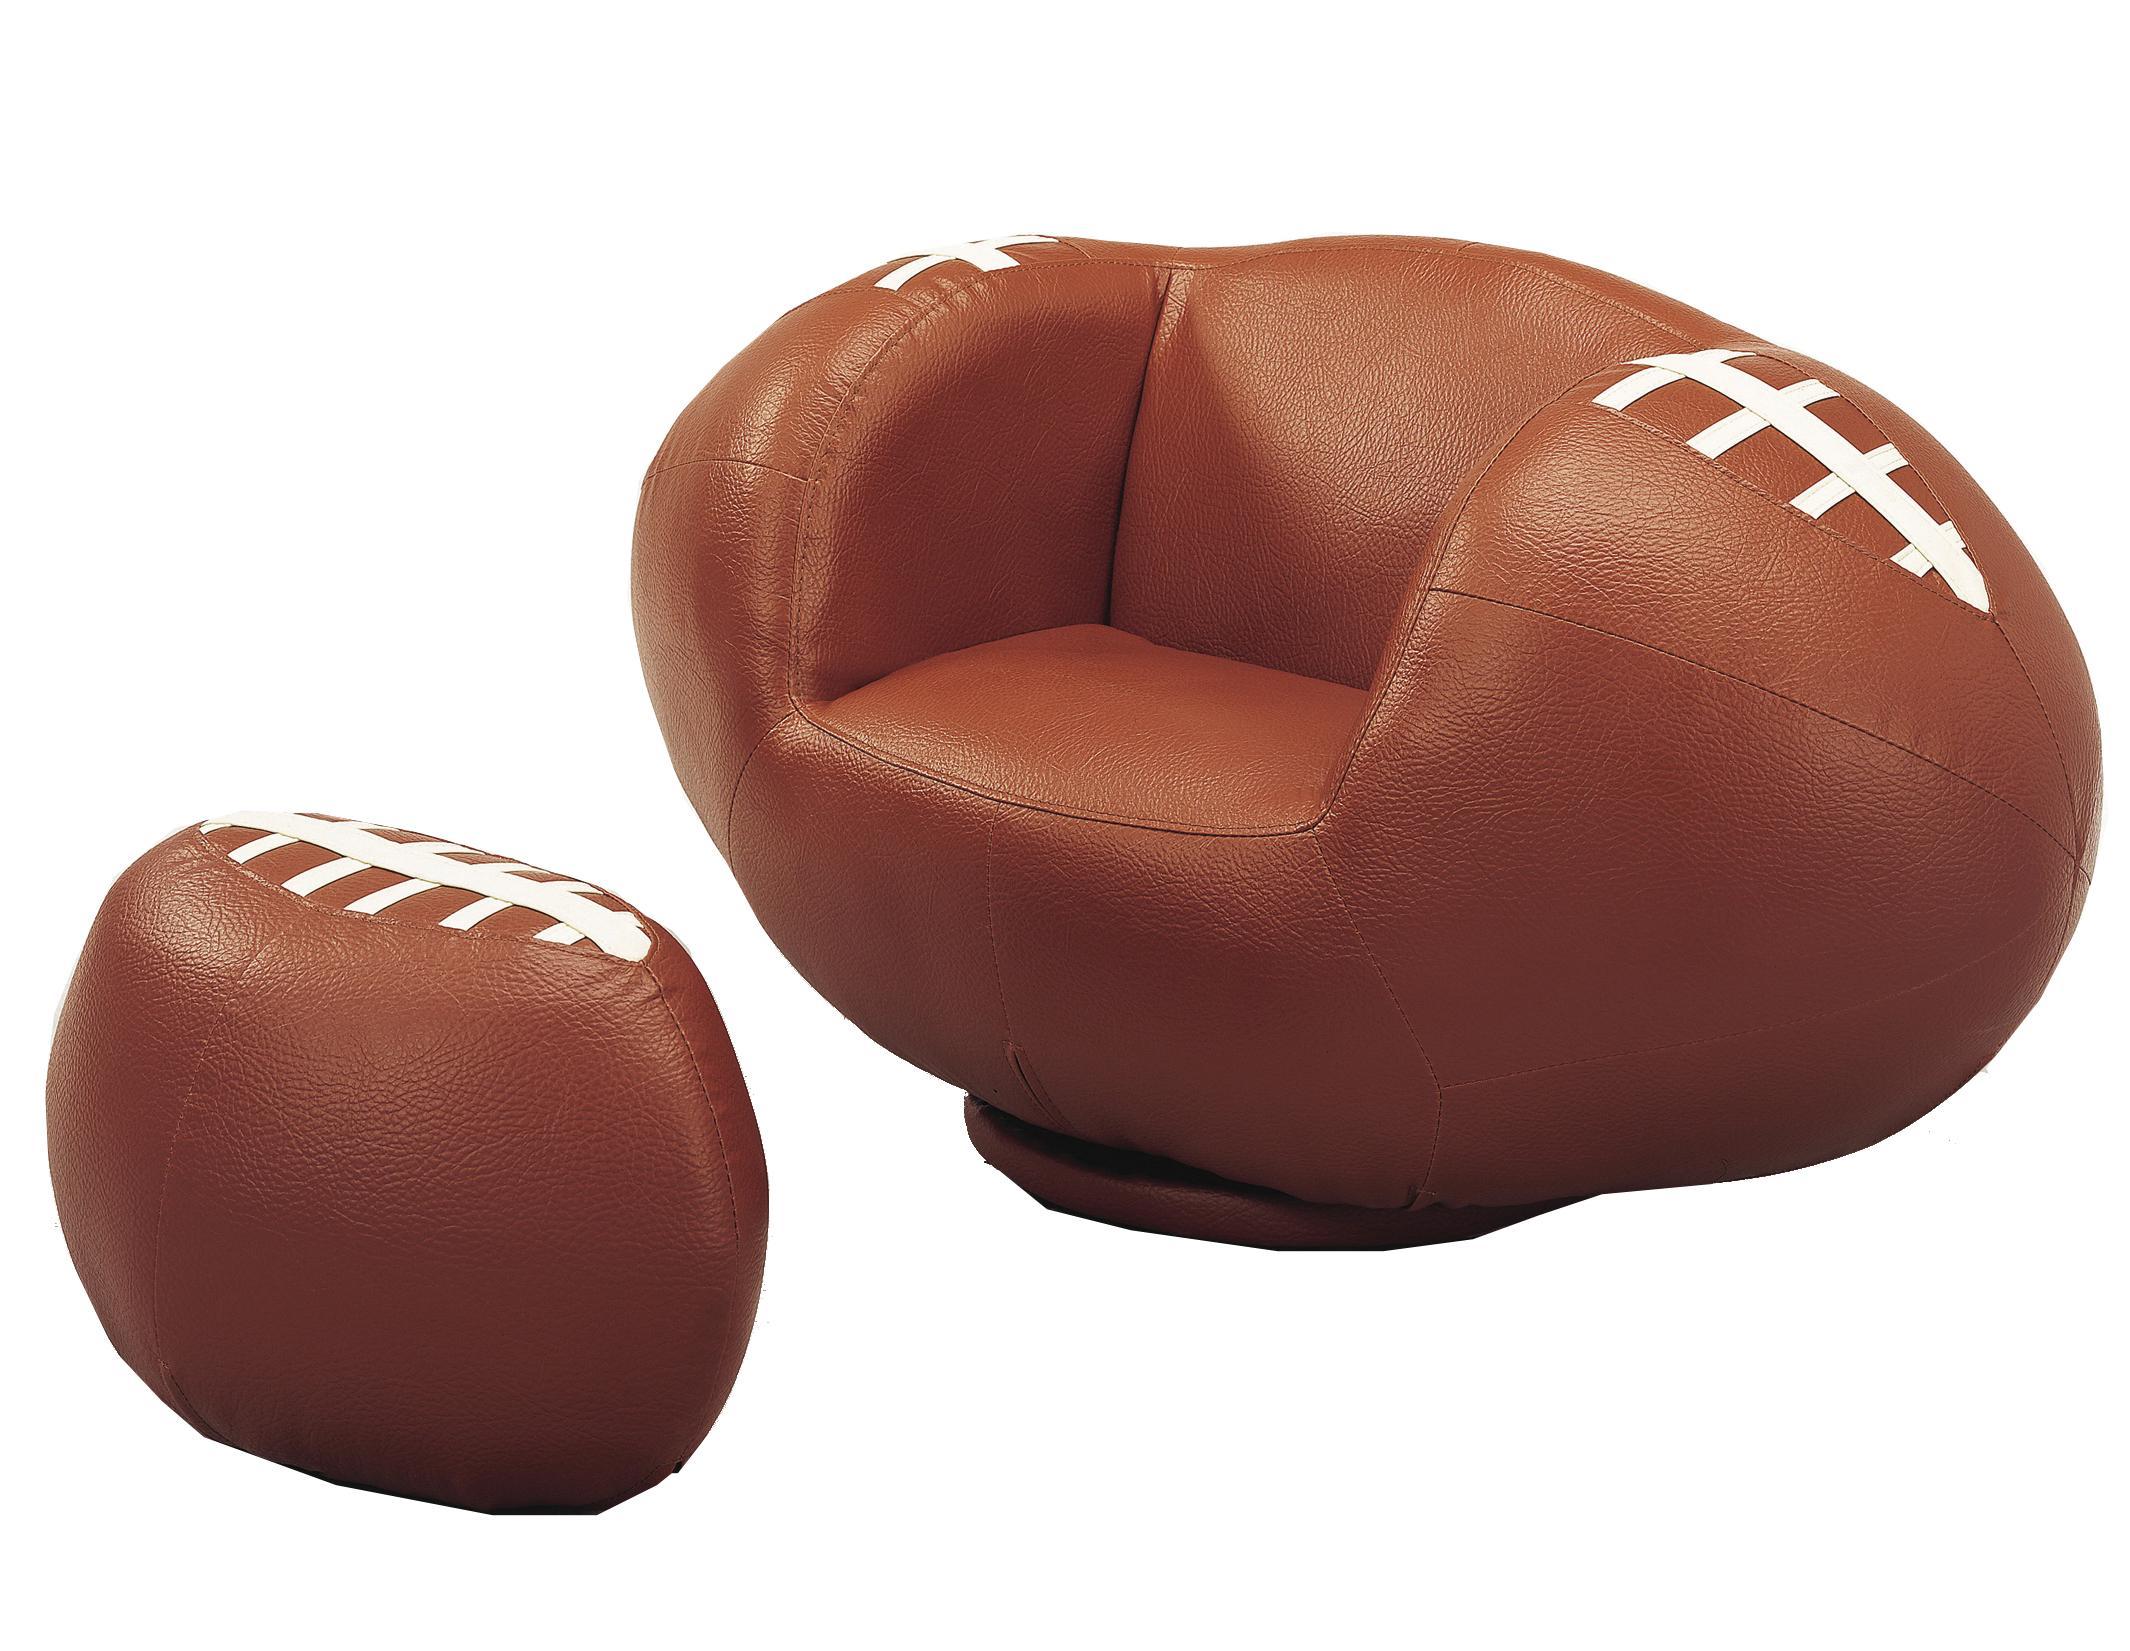 Belfort Essentials Kids Sport Chairs Football Swivel Chair U0026 Ottoman